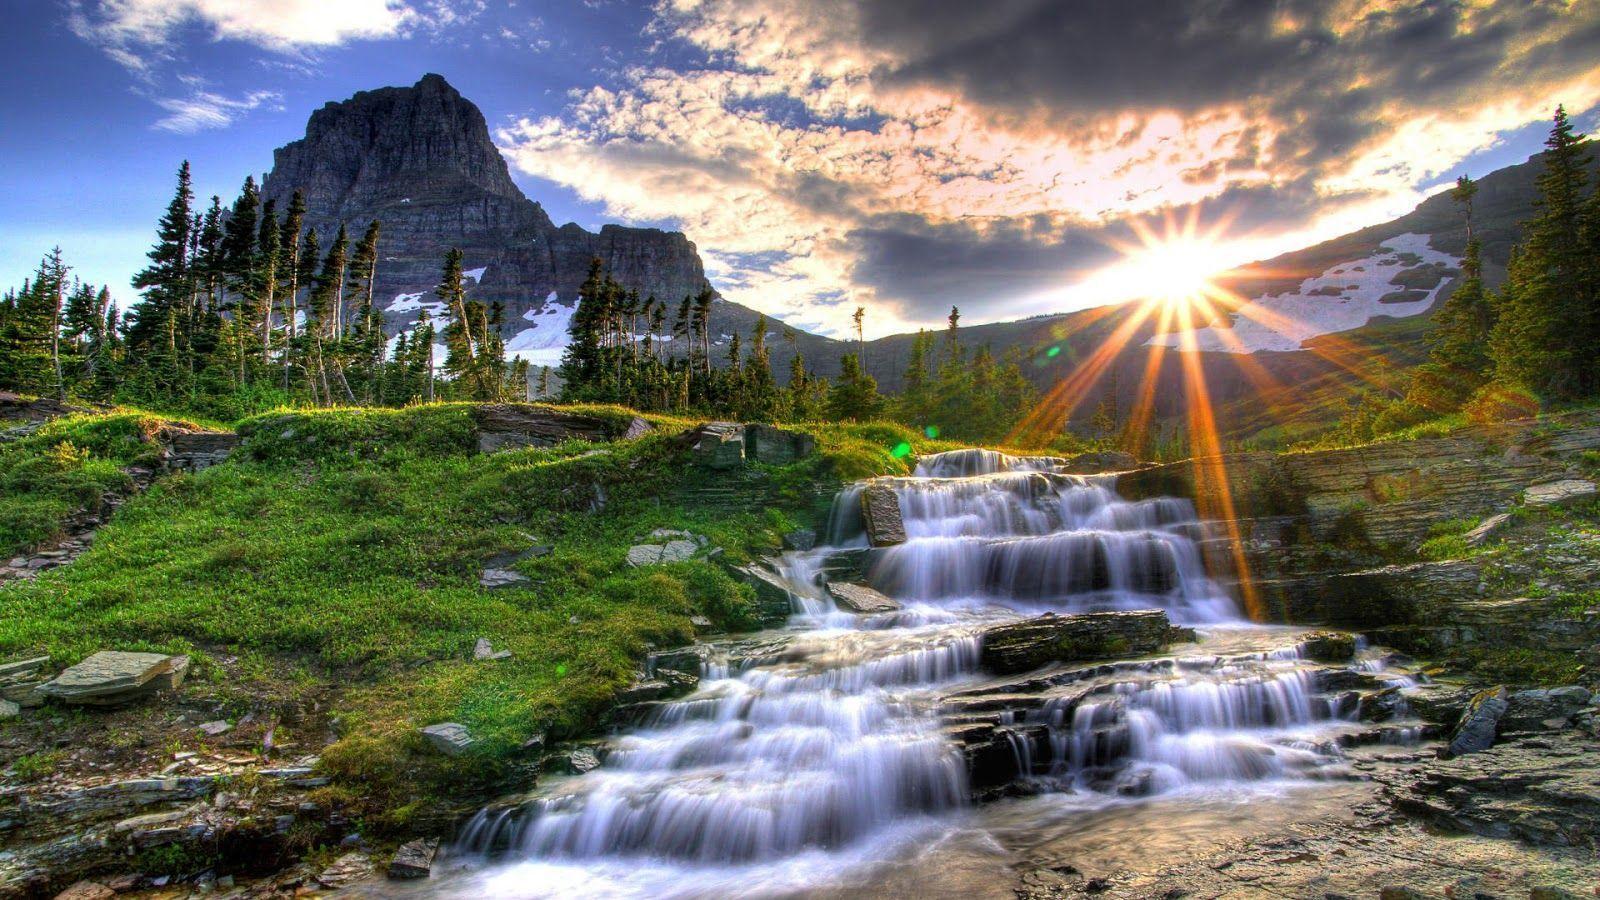 Hd Wallpaper Nature 1080p 19 Beautiful Places To Visit Beautiful Waterfalls Waterfall